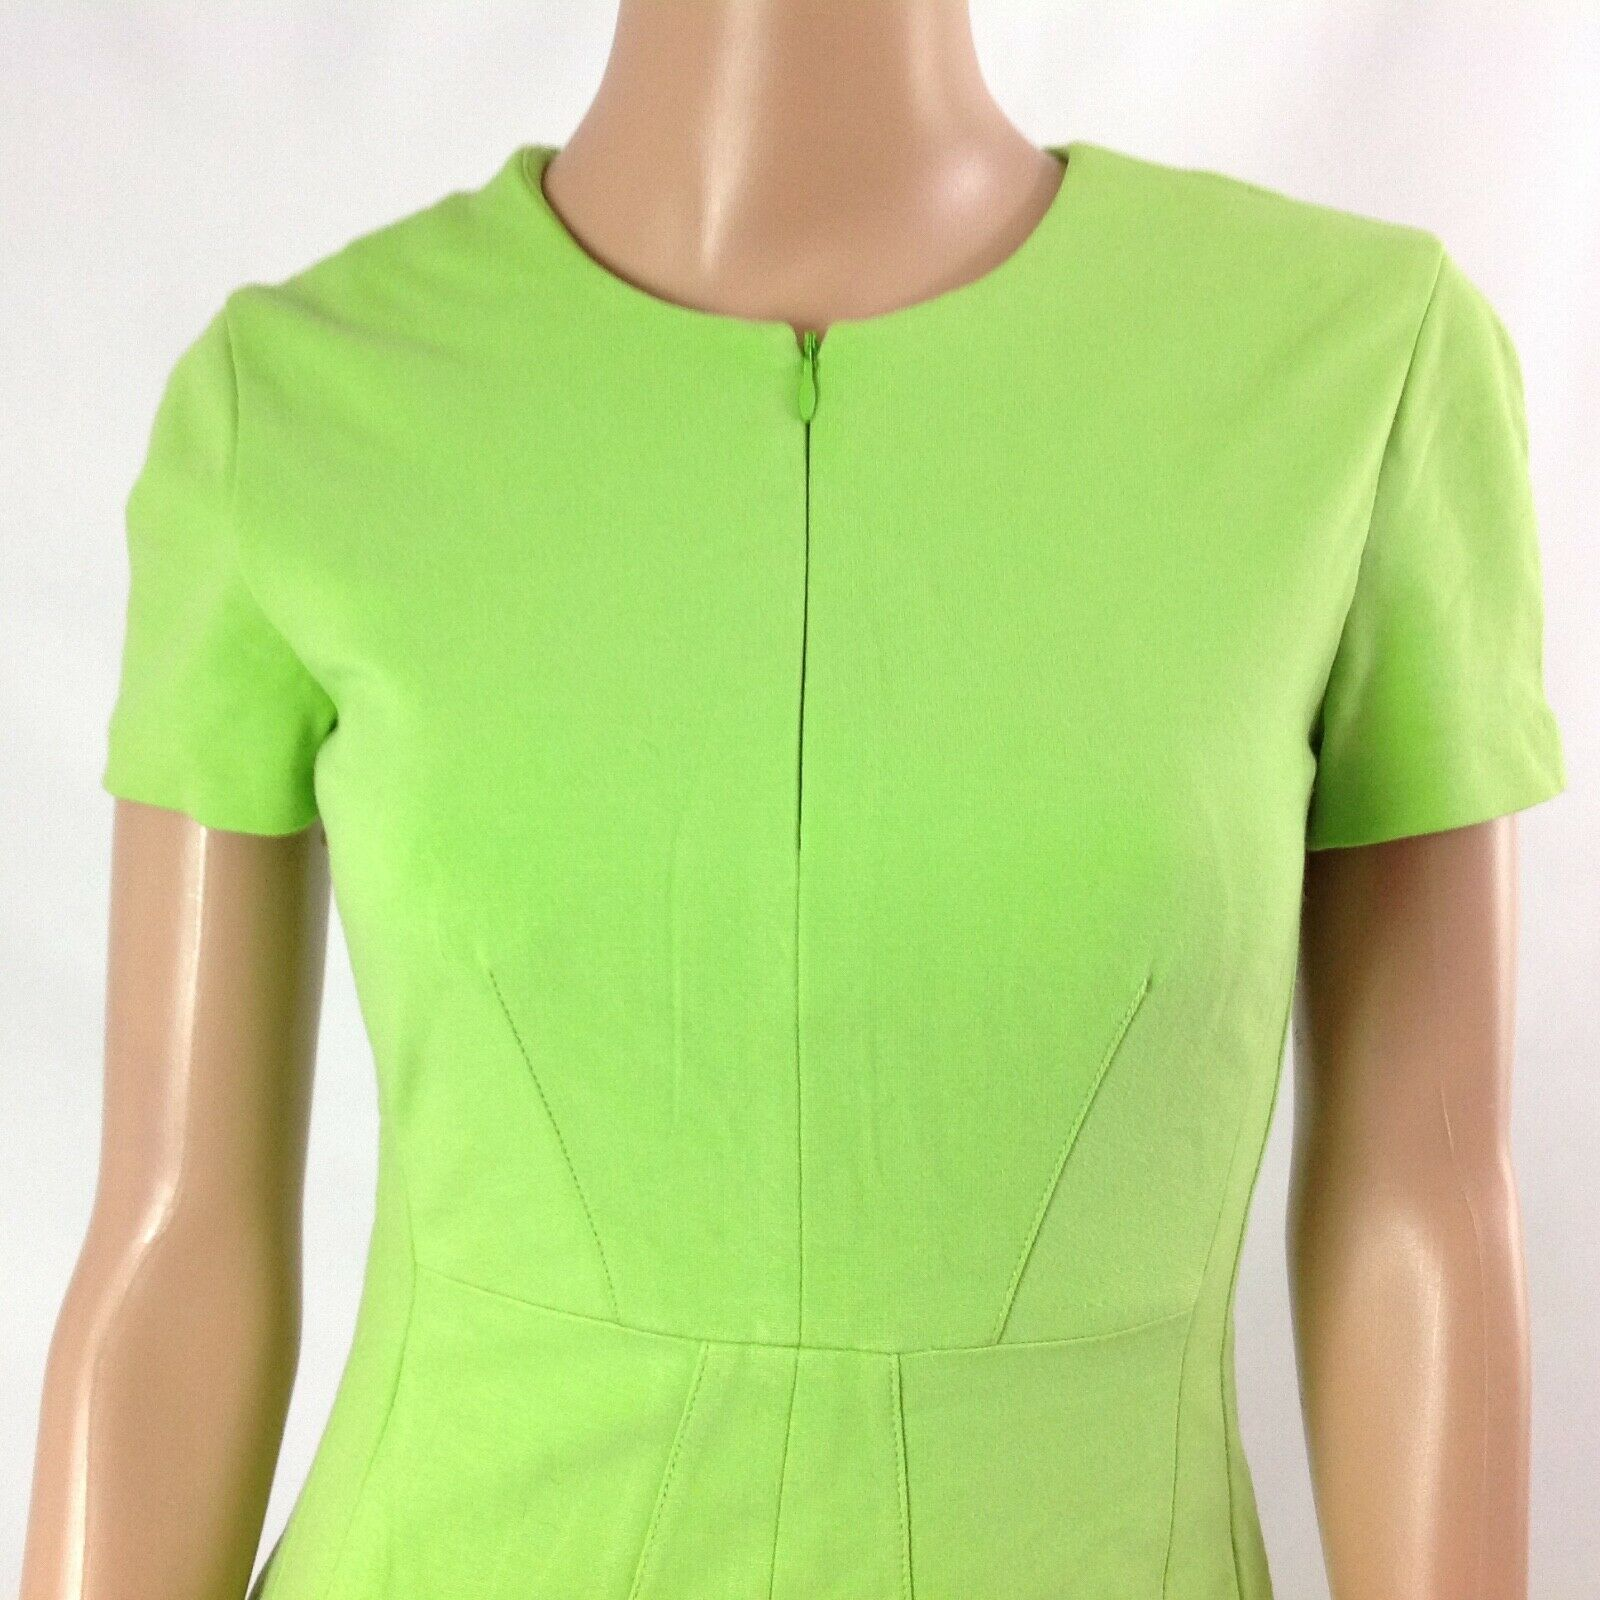 Diana von Furstenberg Agatha Knit Suiting Lime Gr… - image 5